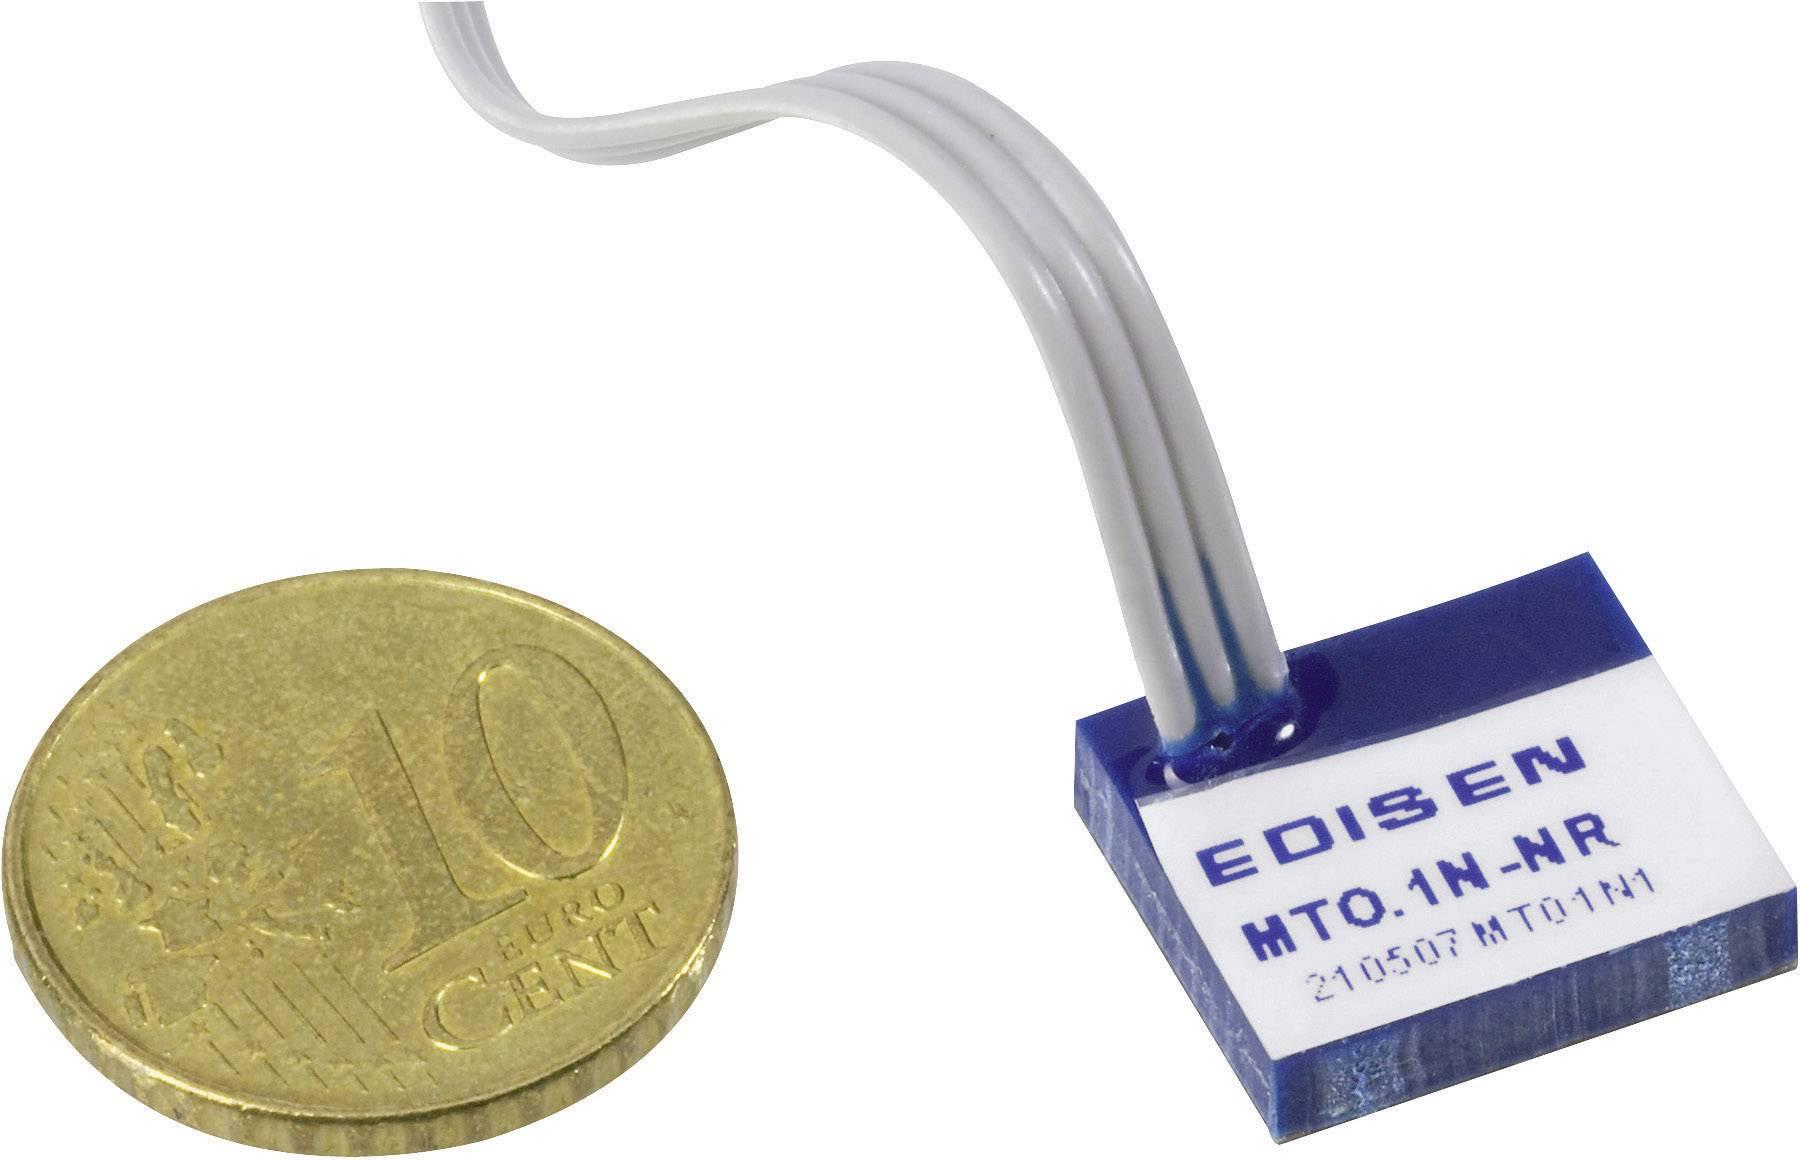 Senzorový spínač MT0.1N-NR, MT0.1N-NR